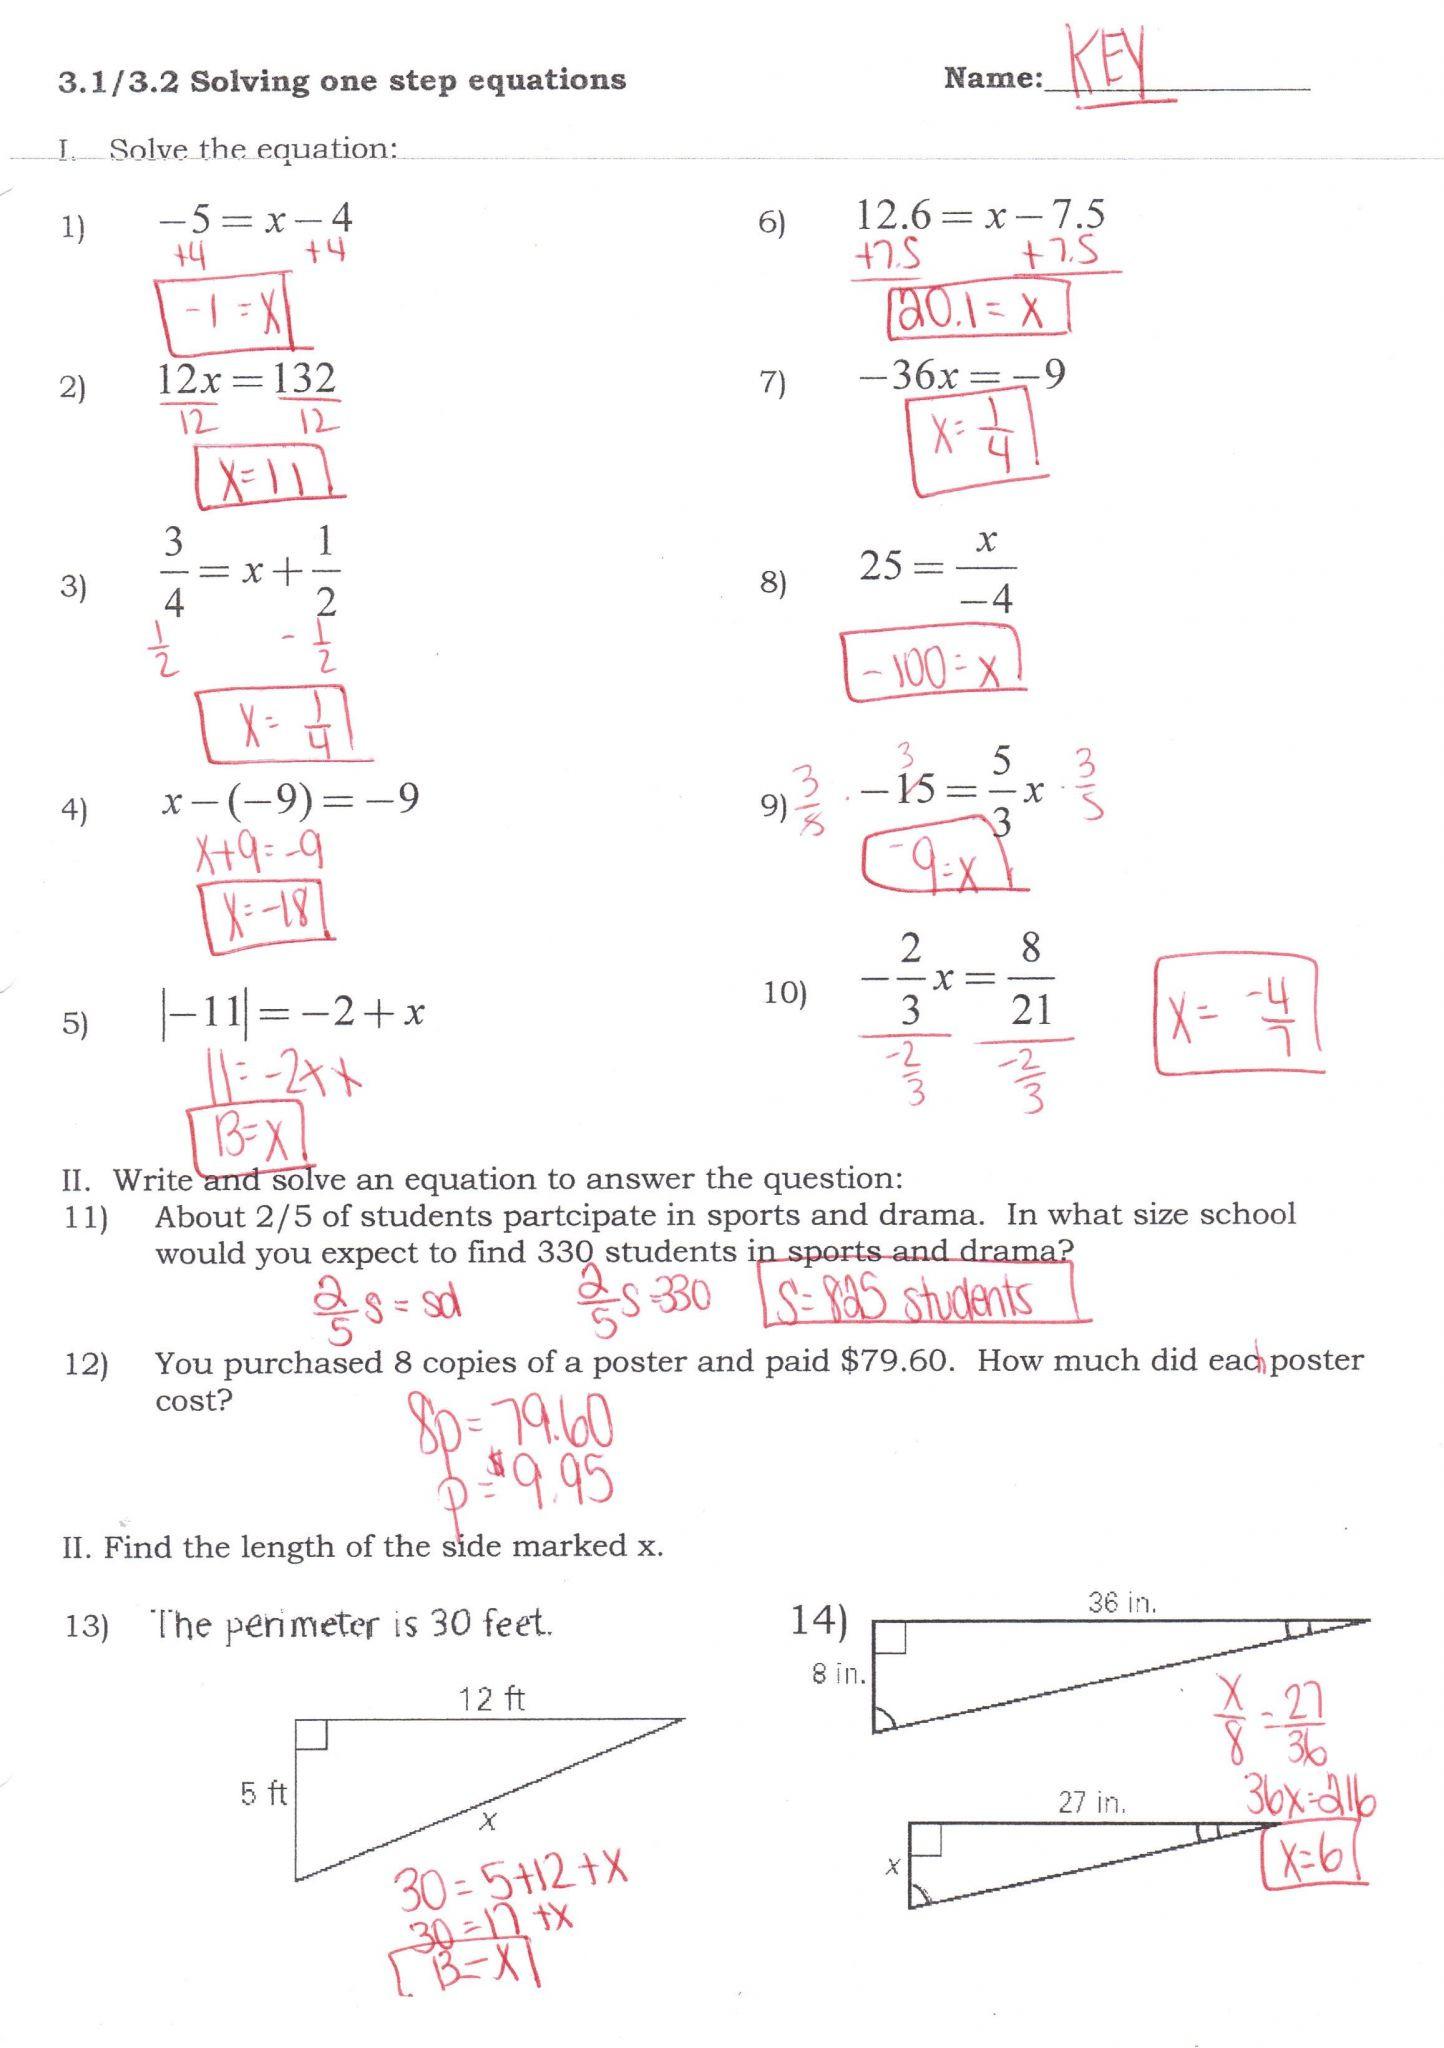 Multi Step Inequalities Worksheet Multi Step Equations and Inequalities Worksheet Answers